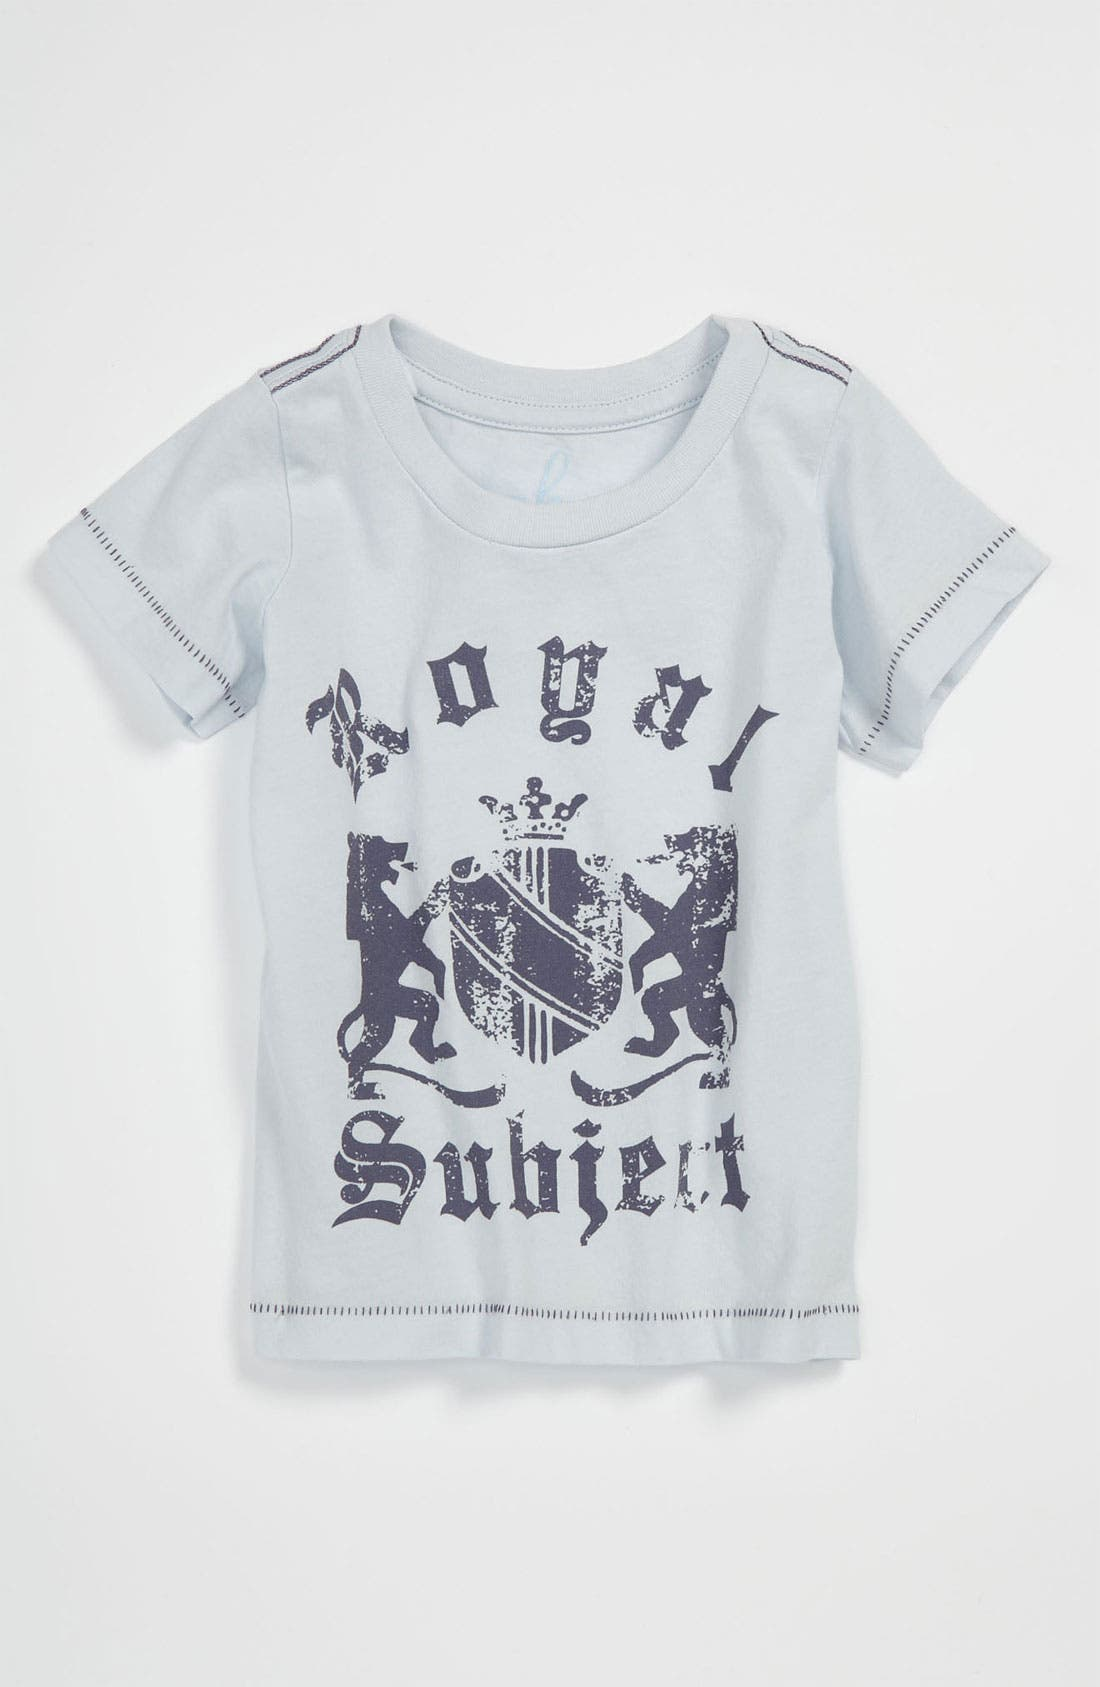 Main Image - Peek 'Royal Subject' T-Shirt (Infant)